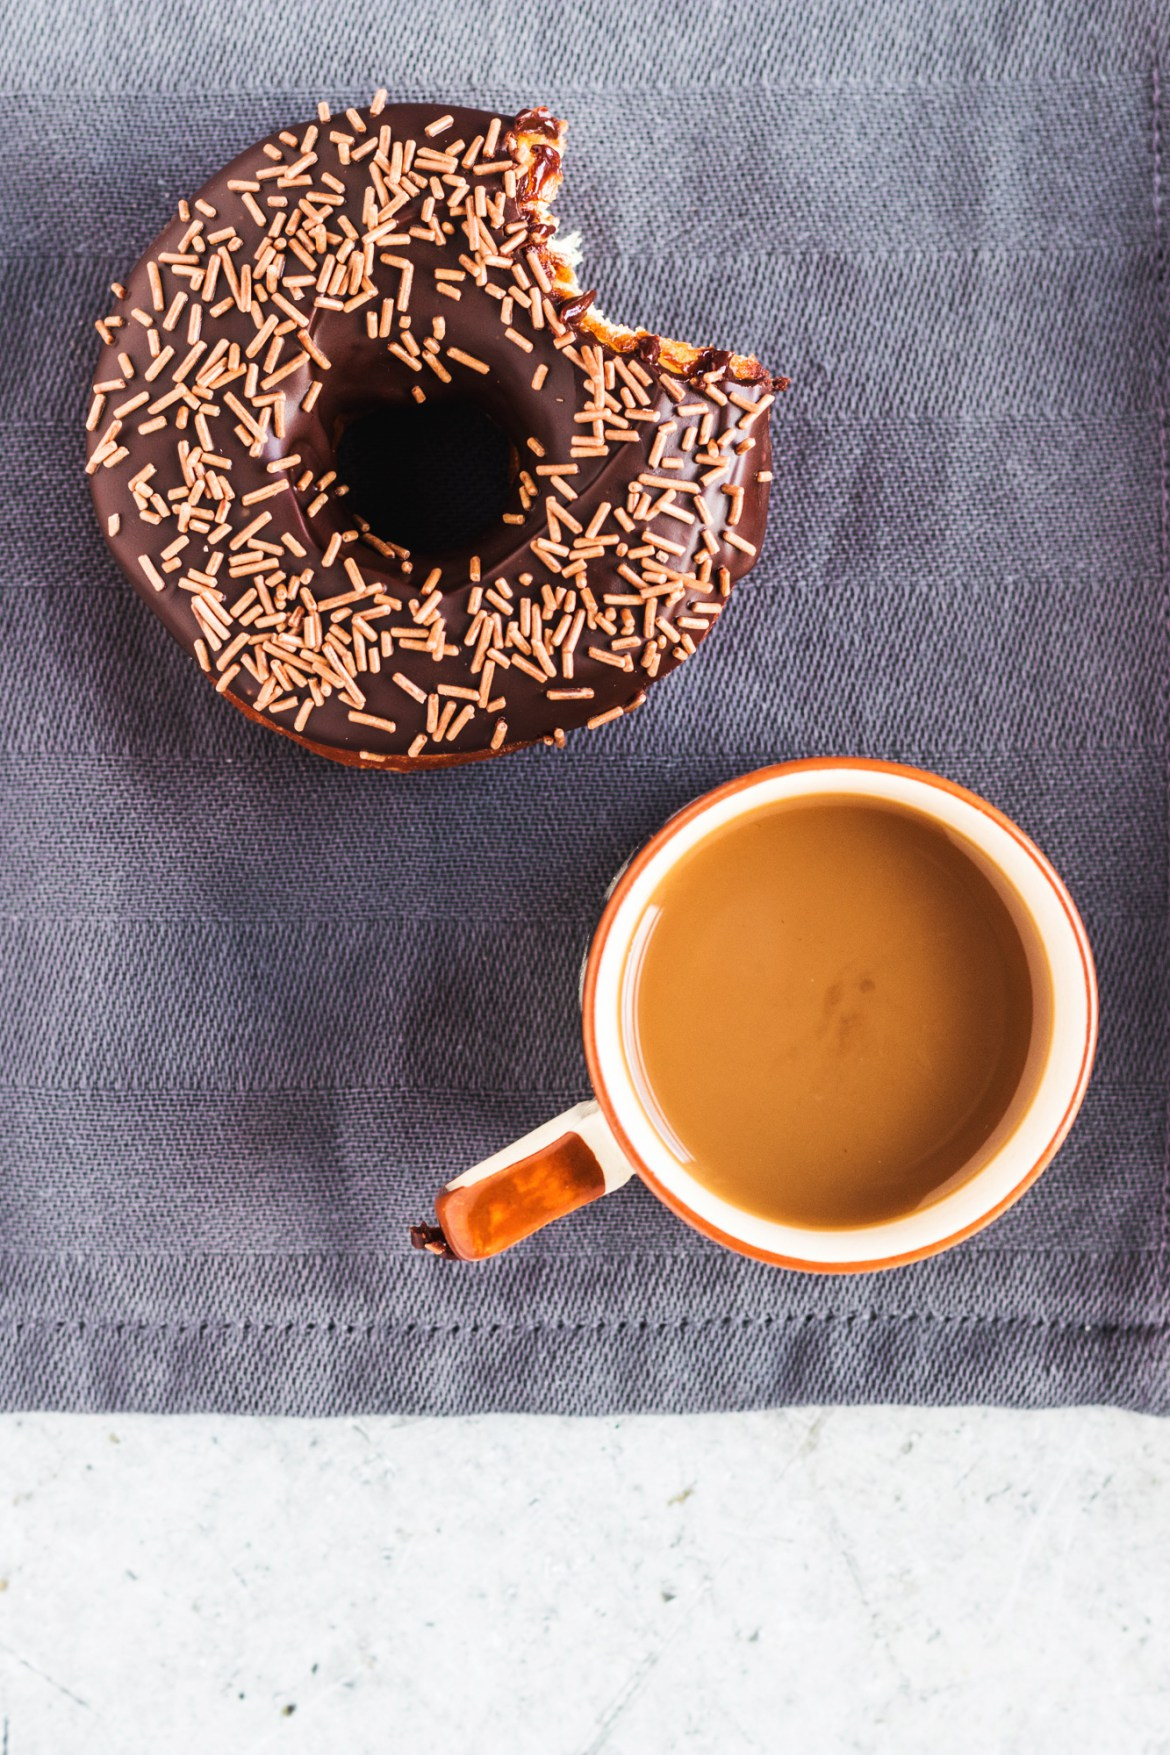 Vegan Chocolate glazed donuts